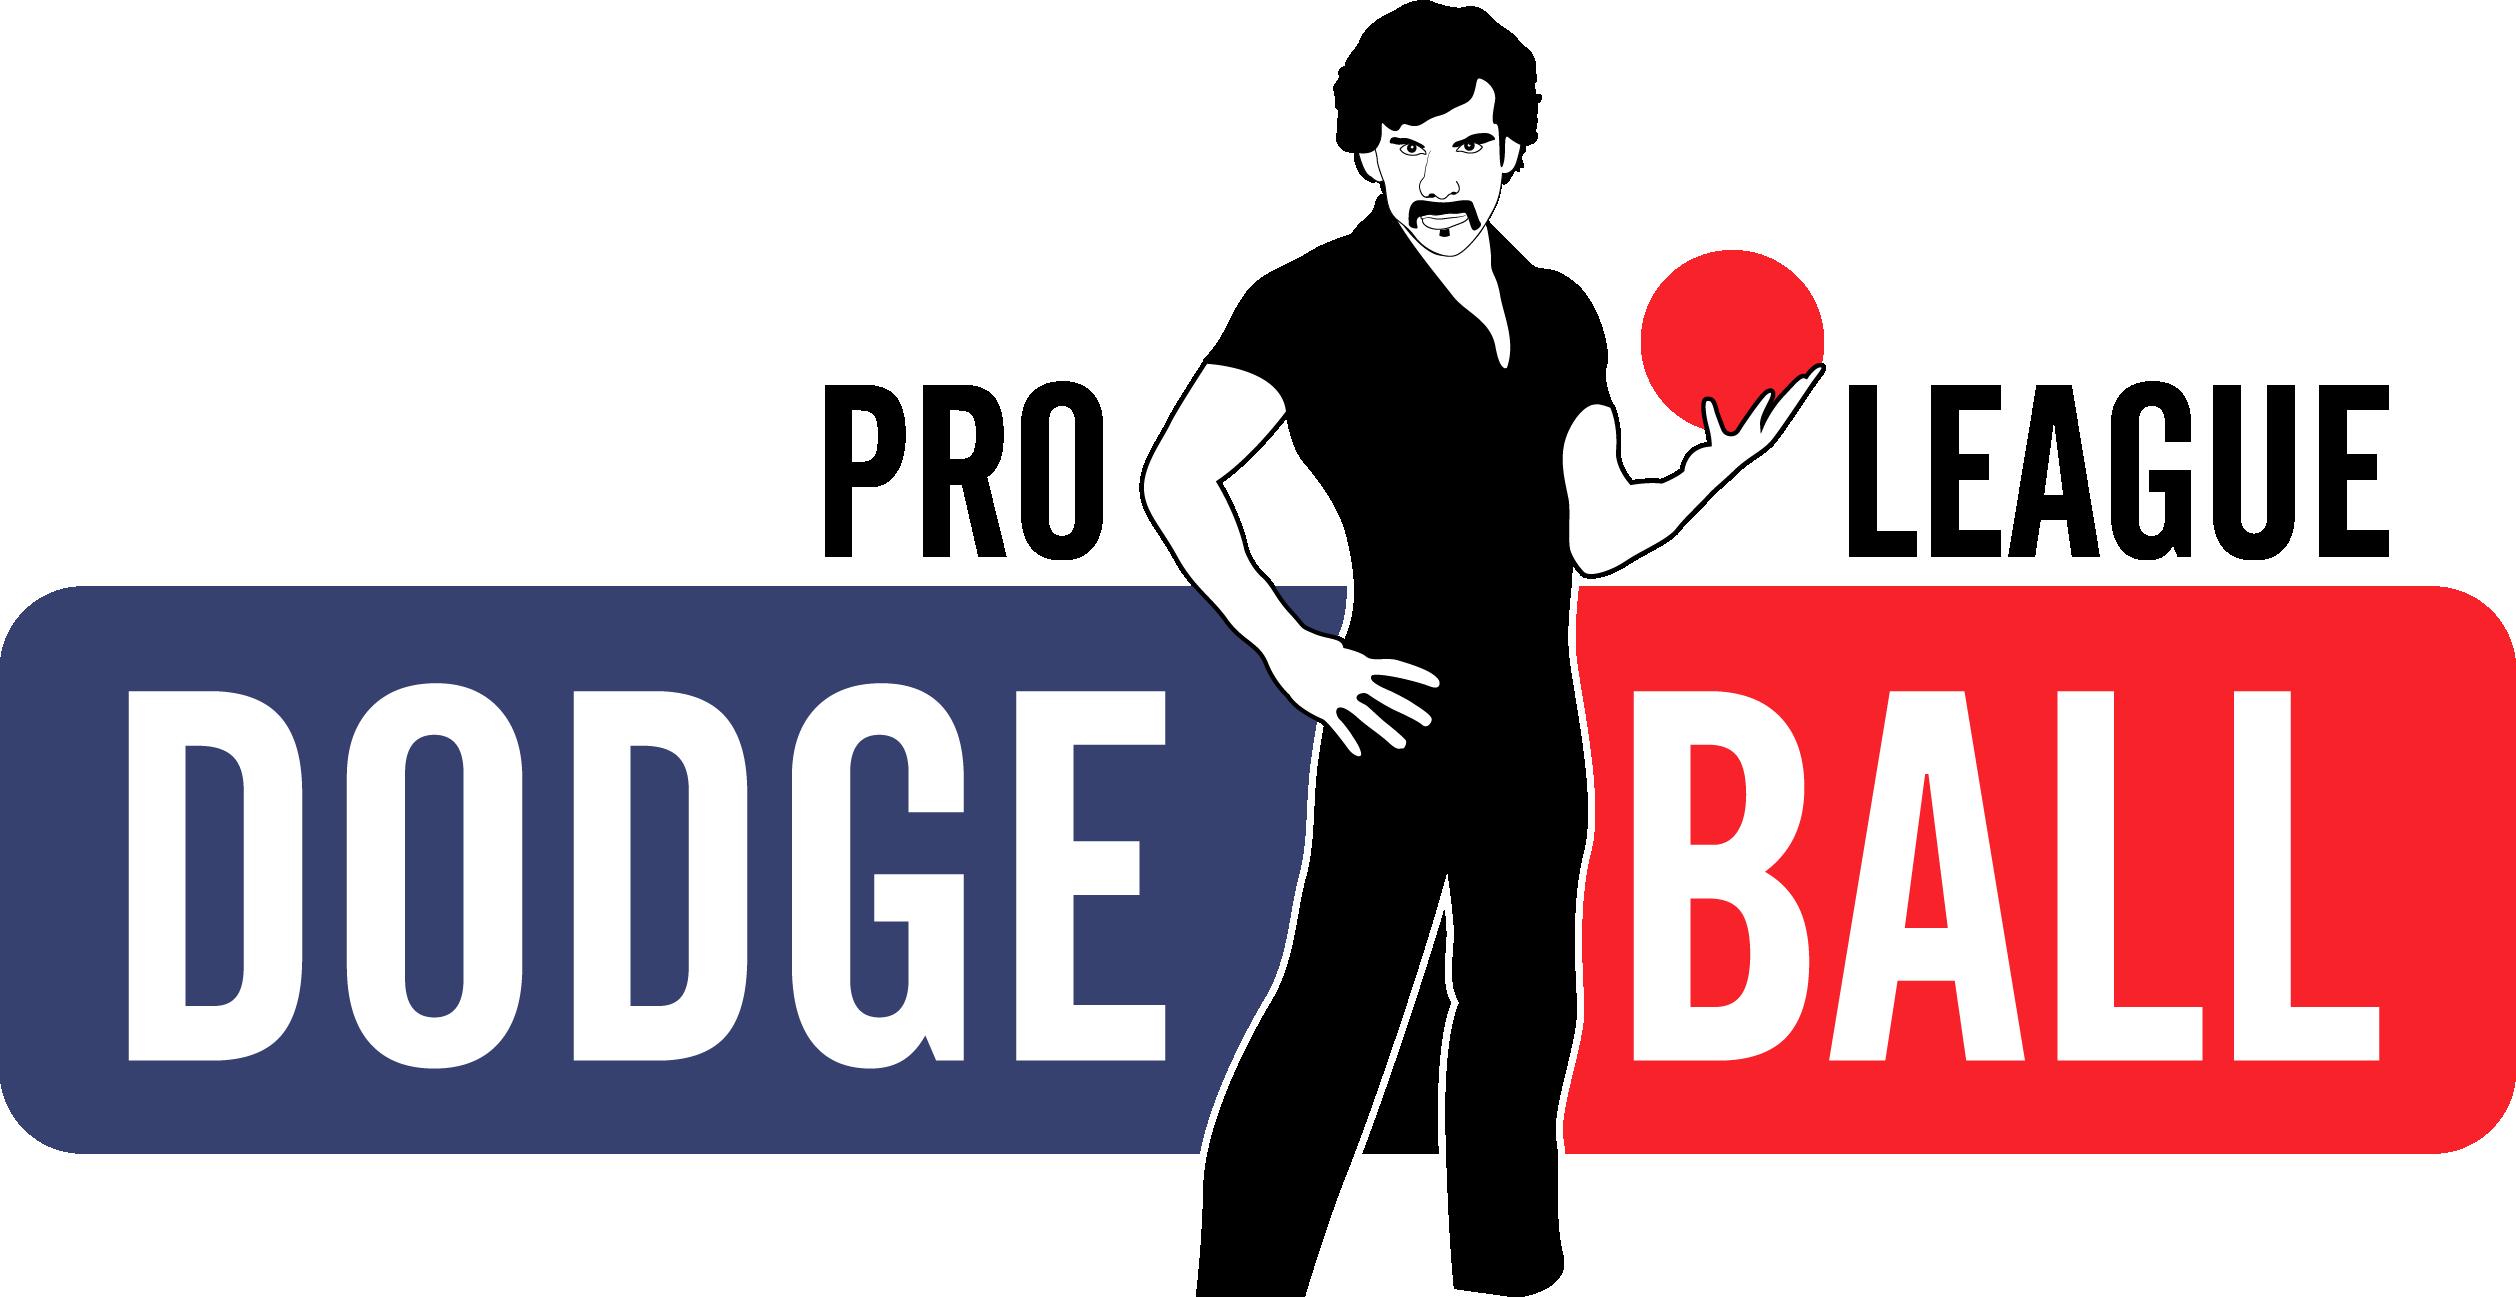 Pro league . Dodgeball clipart dodge ball